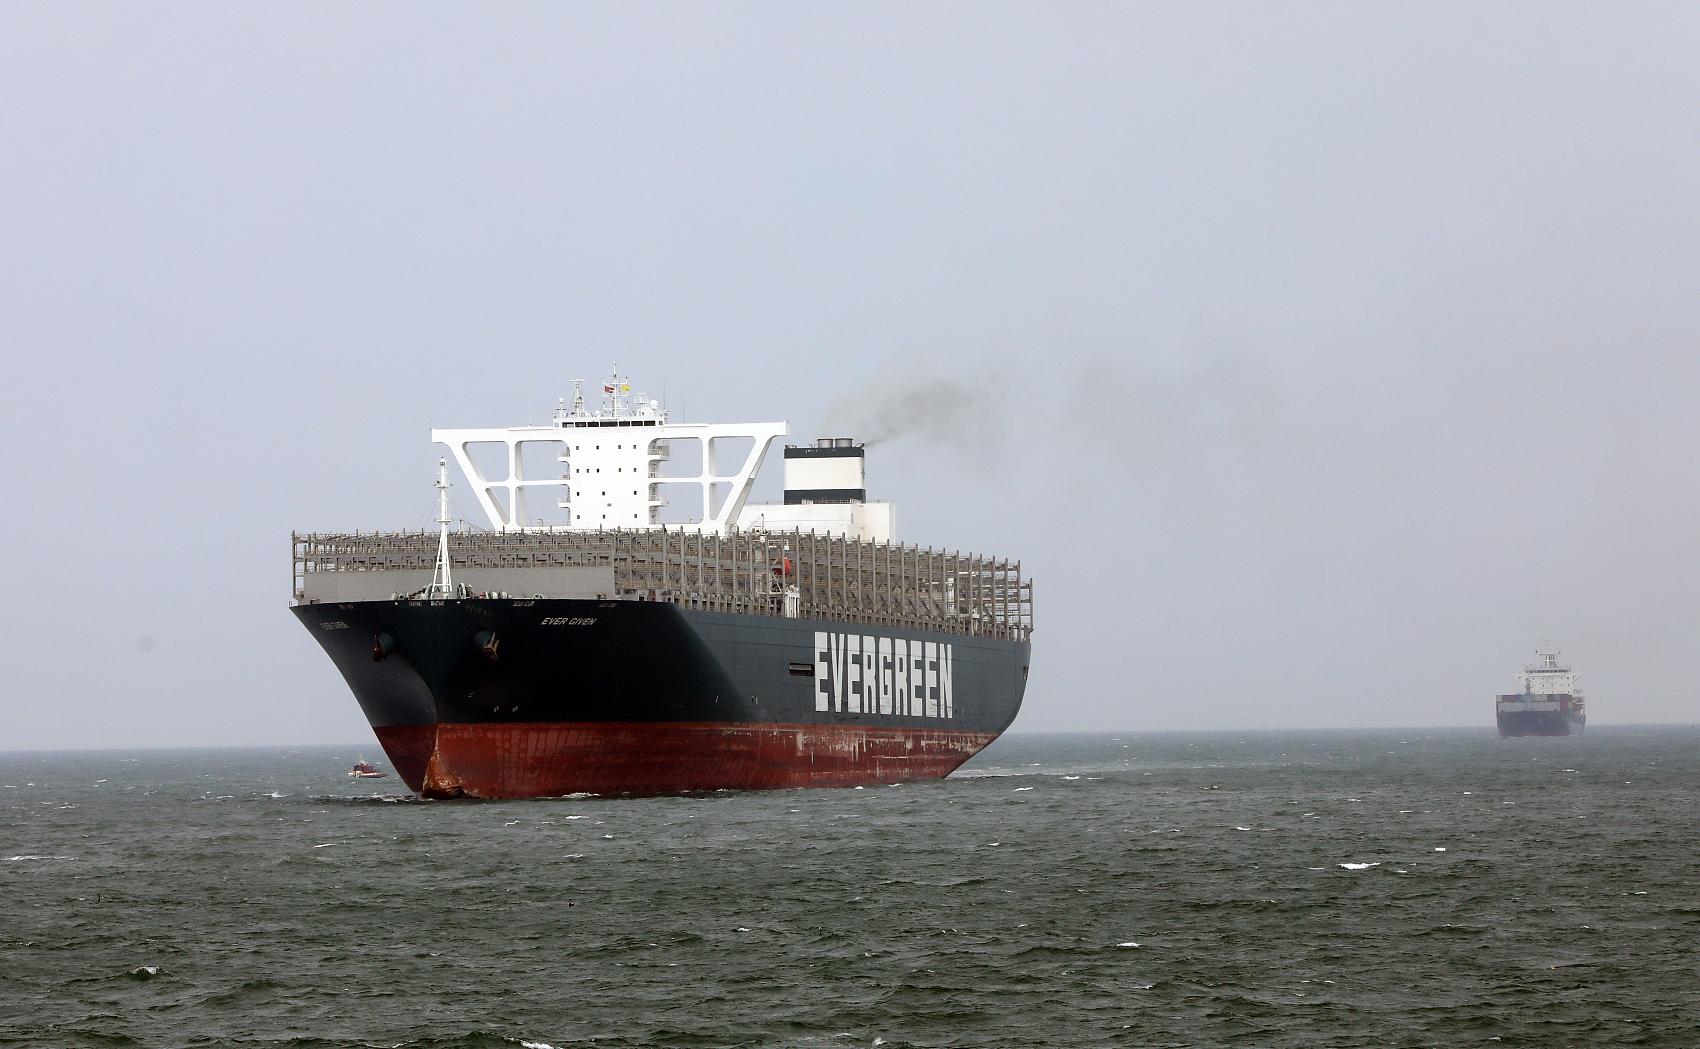 Ship that blocked Suez Canal is under repair